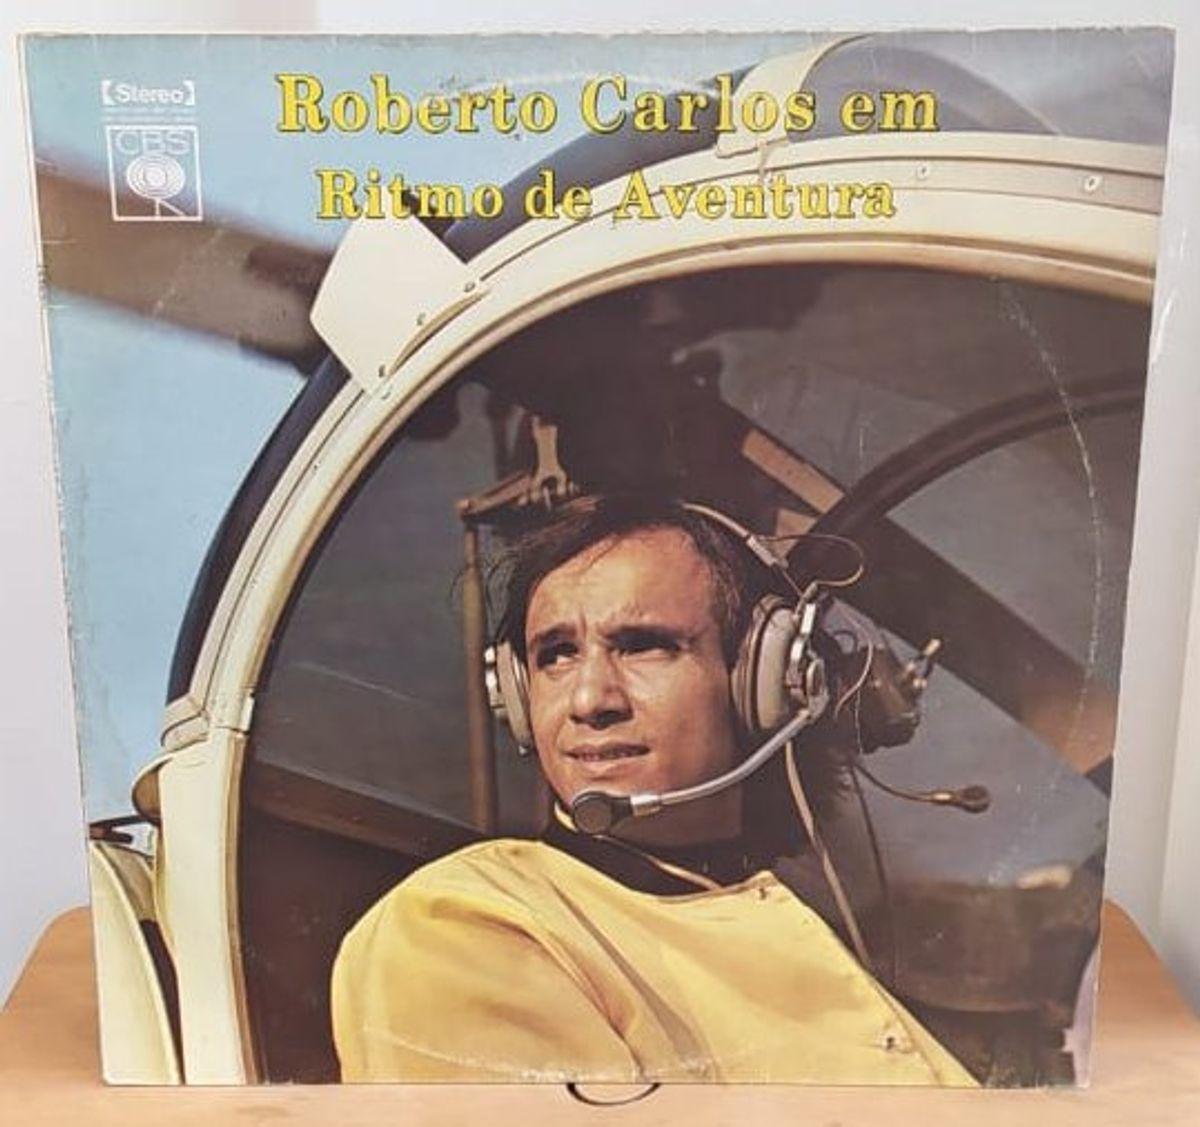 Lp Roberto Carlos em Ritmo de Aventura 1971 | Item de